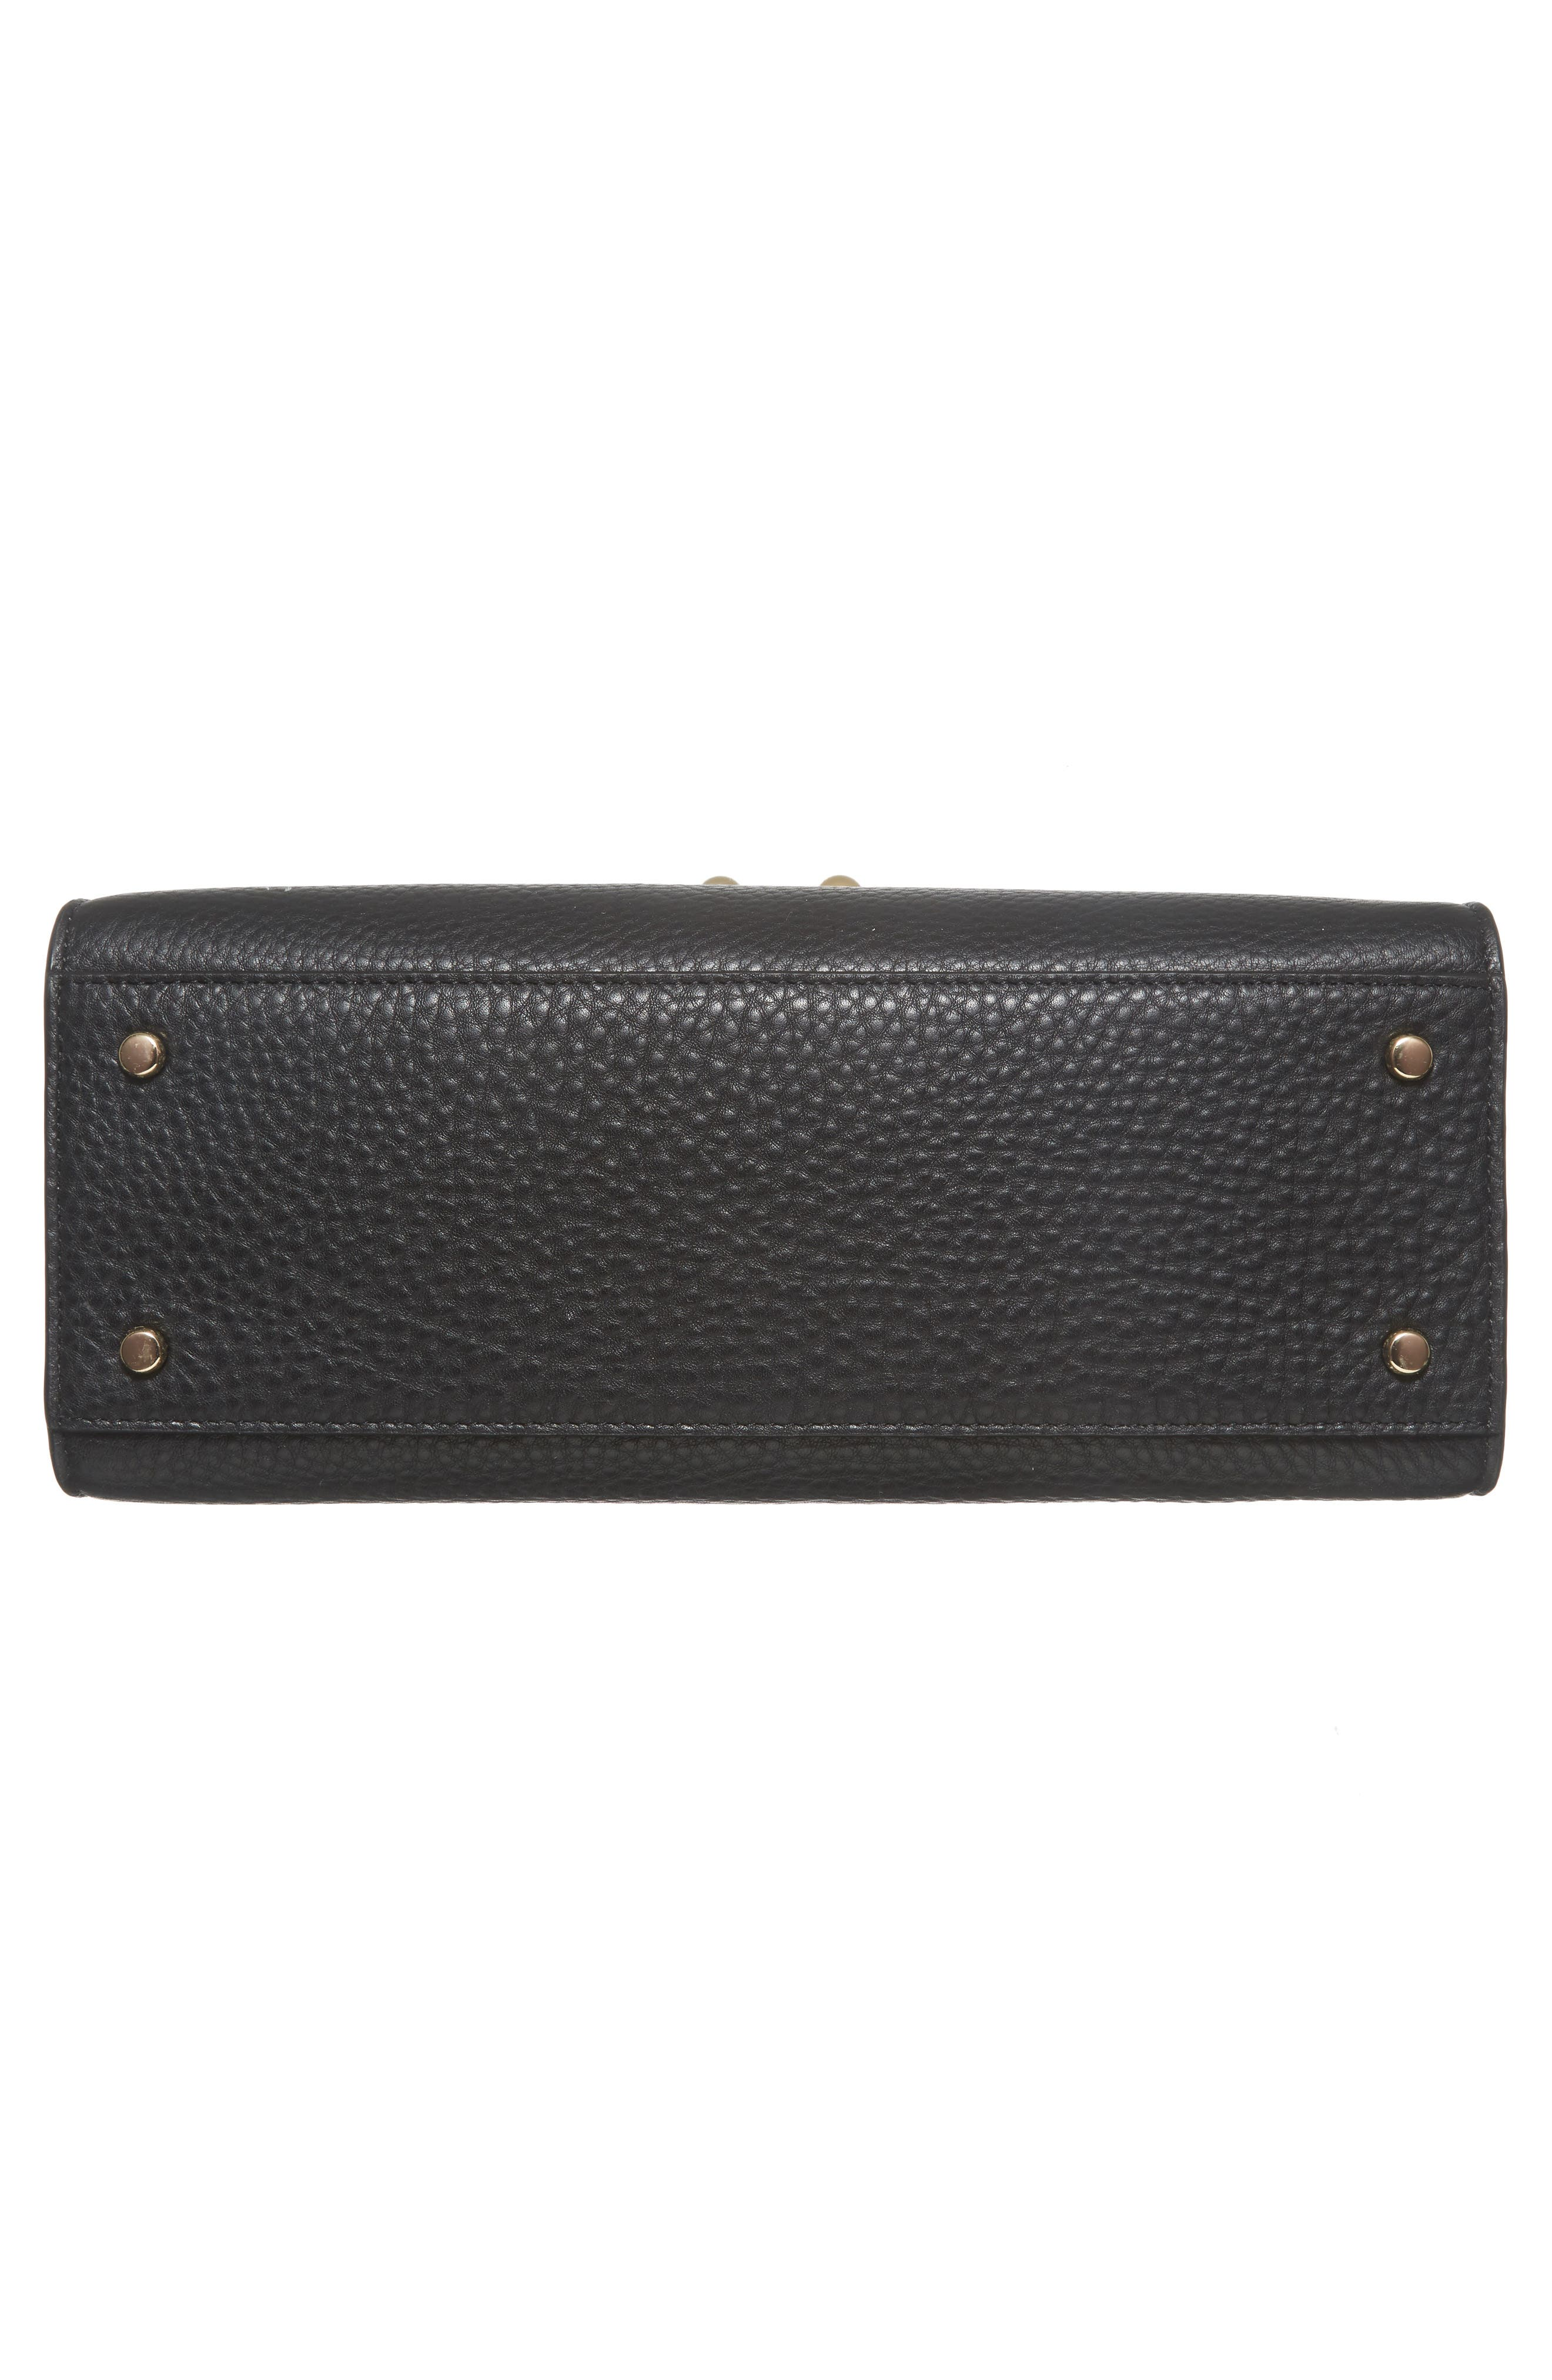 stewart street samira leather top handle satchel,                             Alternate thumbnail 5, color,                             Black